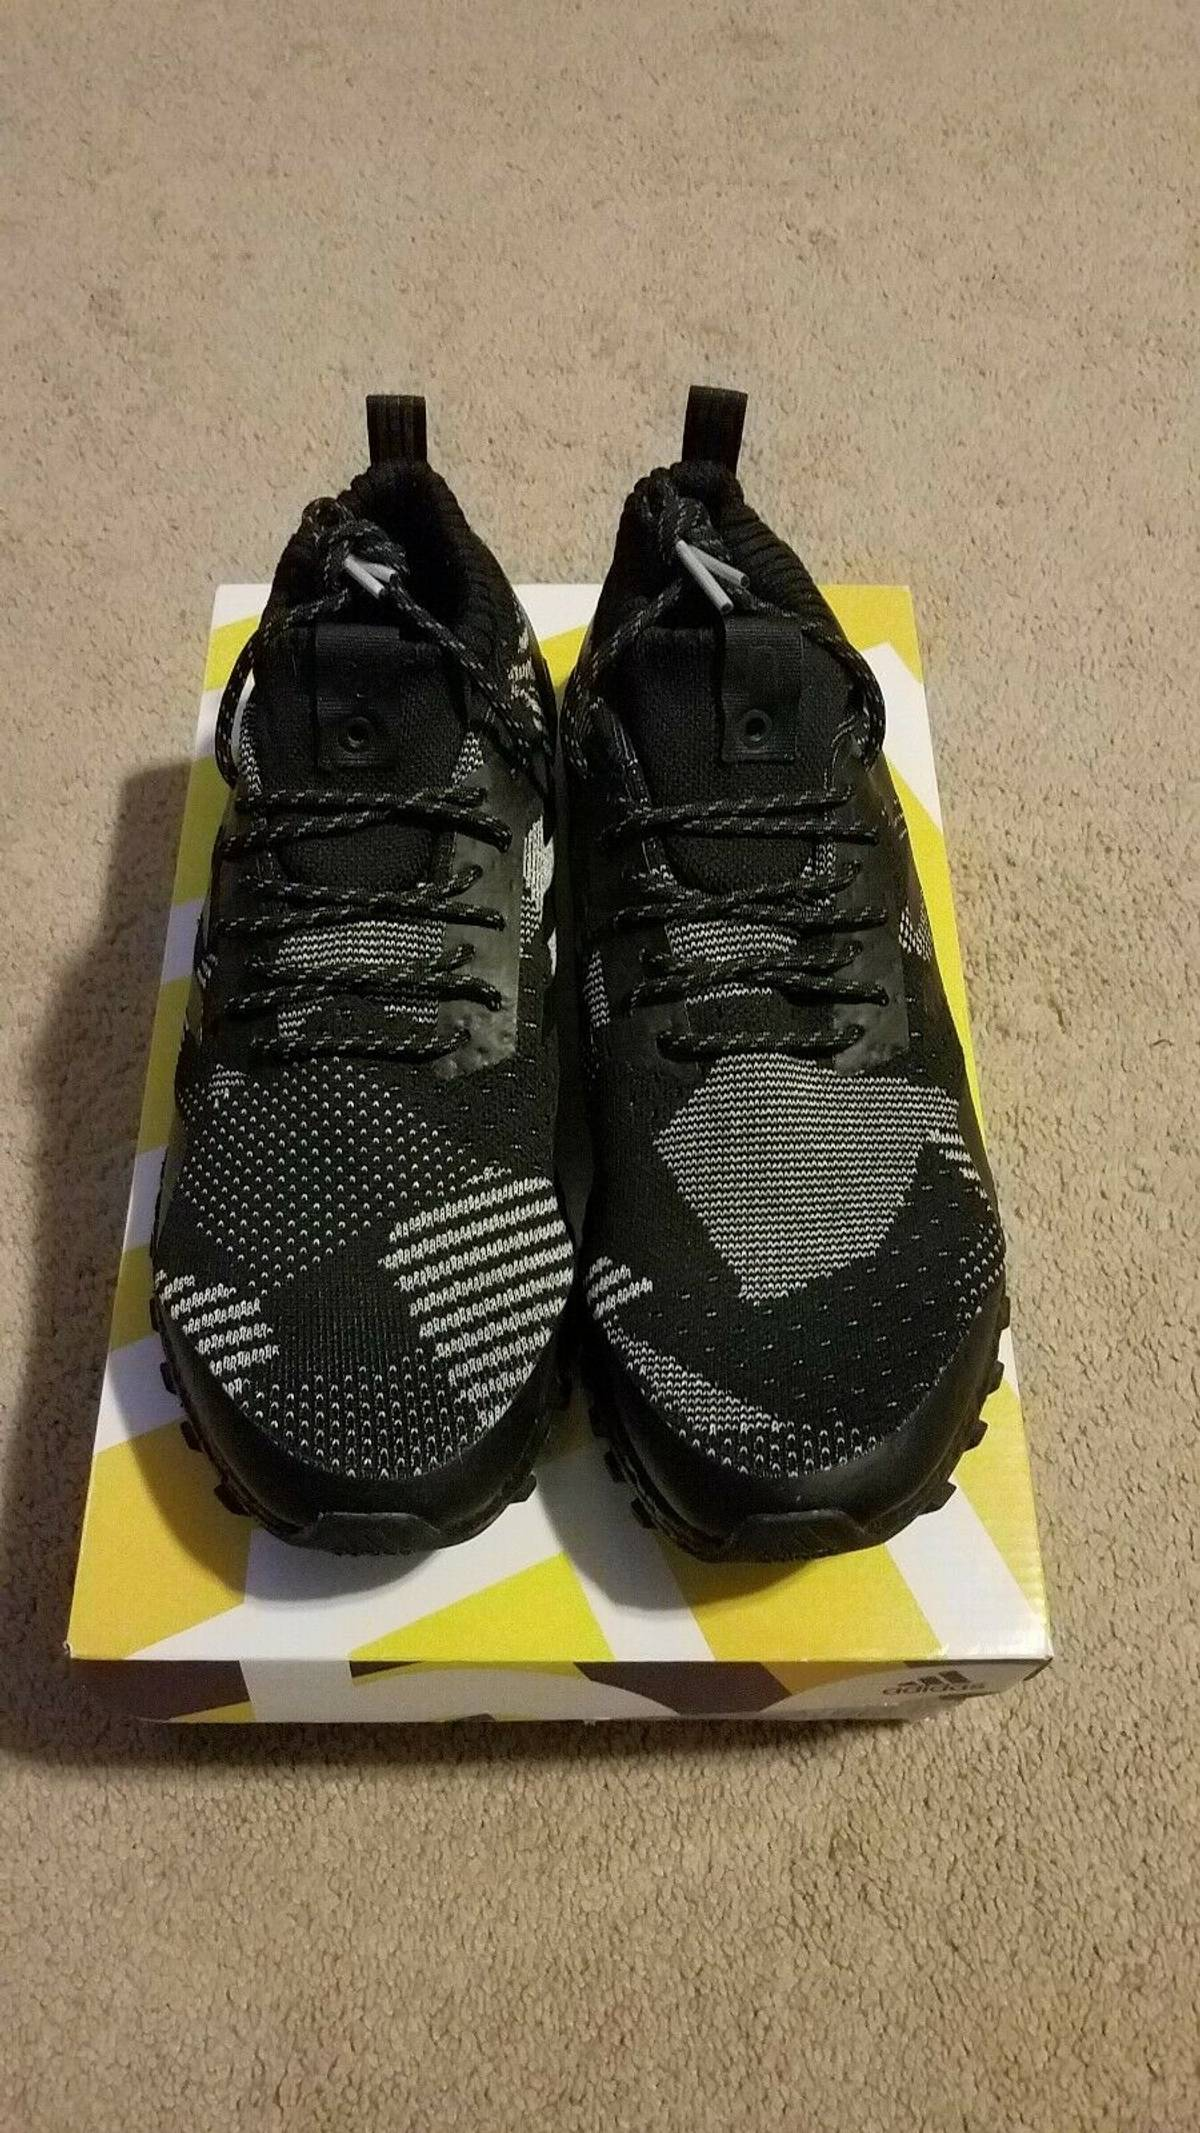 newest f59a3 cb940 Adidas × Kith Nyc × Nonnative Kith X Nonnative X Adidas Consortium  Ultraboost Mid Atr Black / Patchwork Size 12 $325